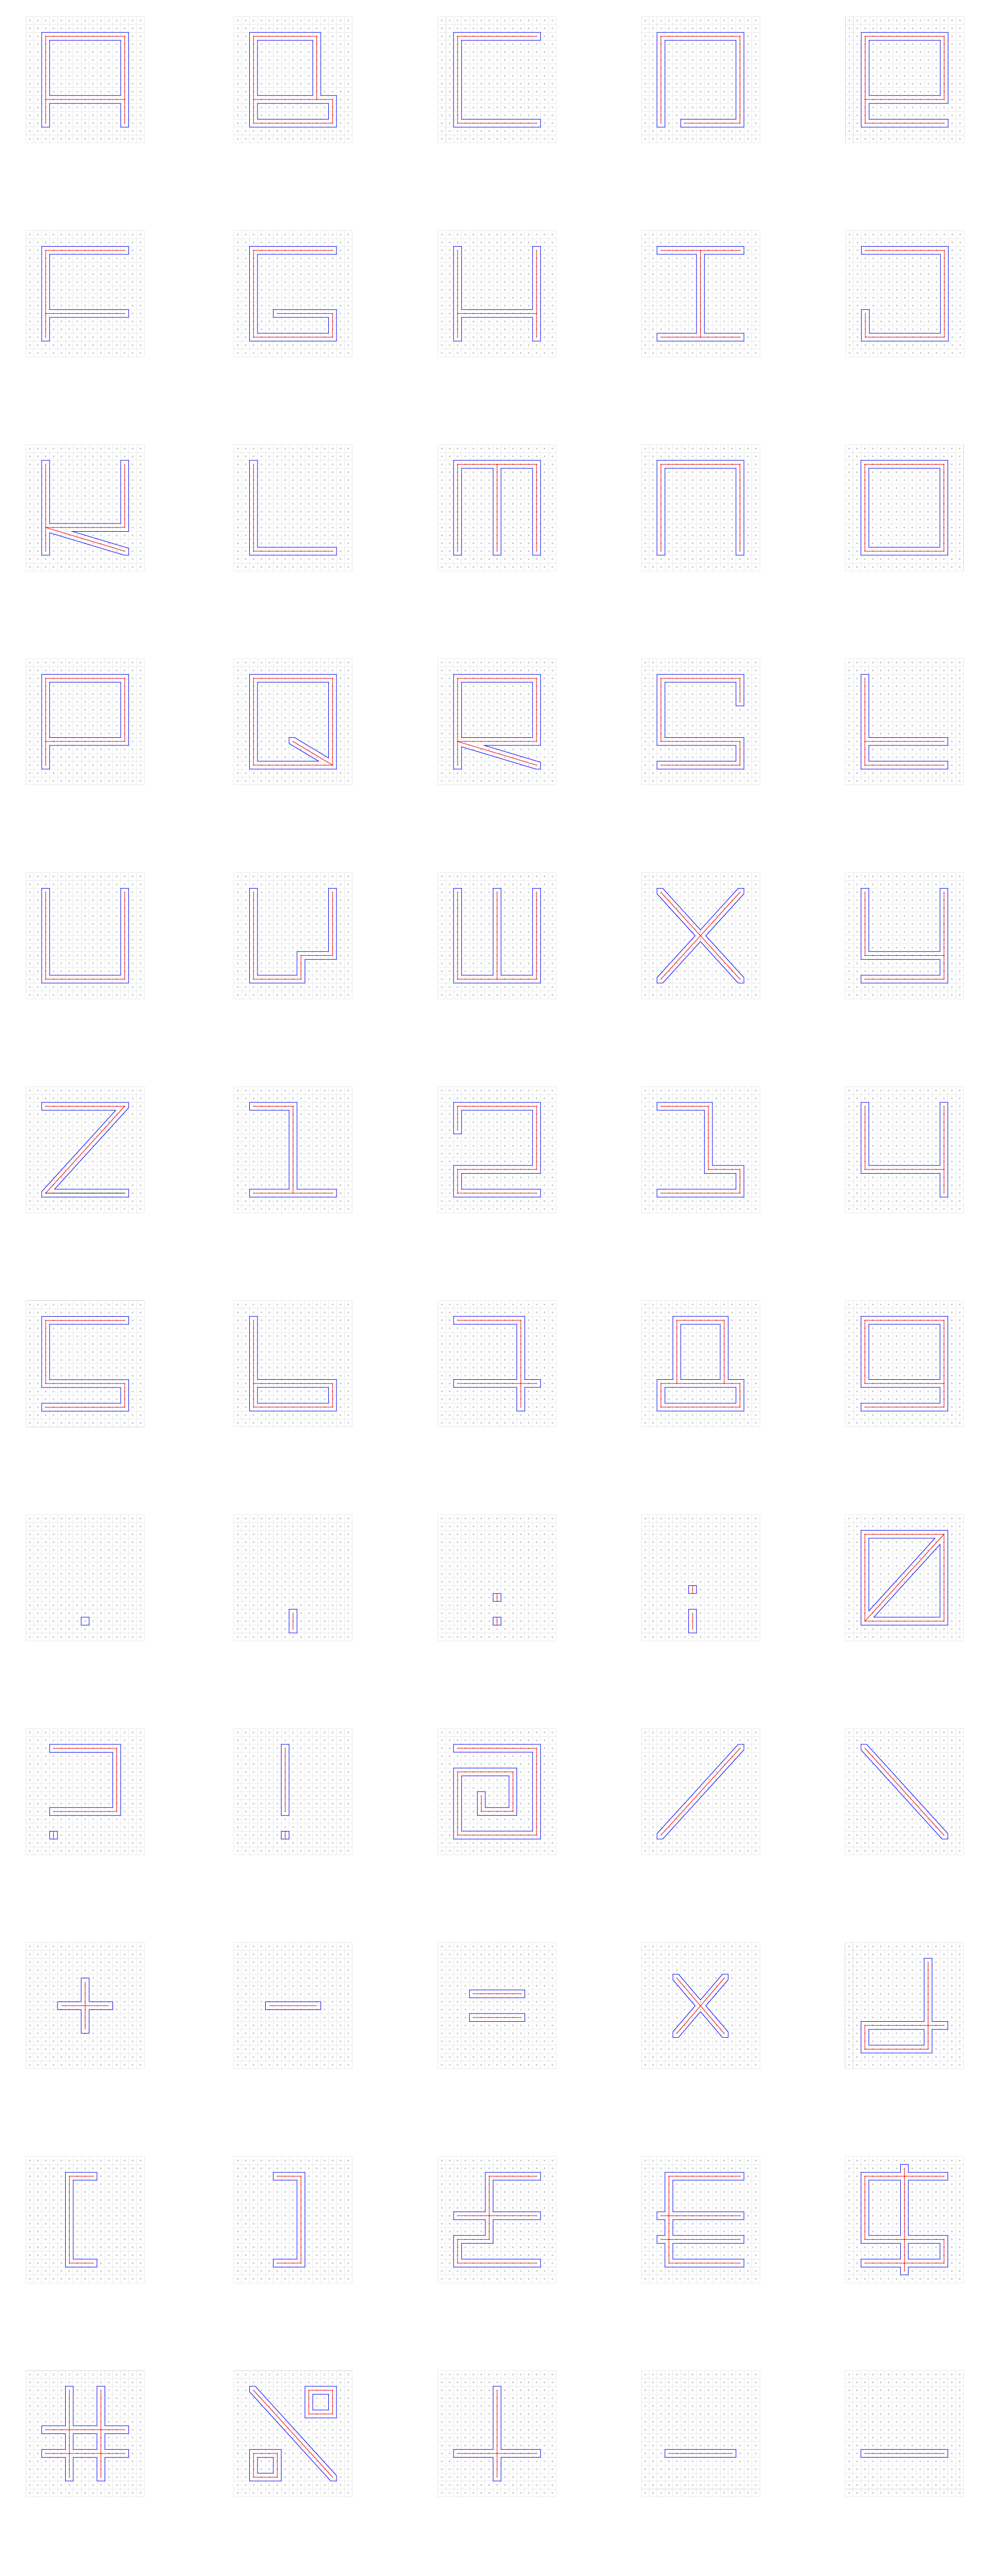 vlevle-gamatik-typography-grid